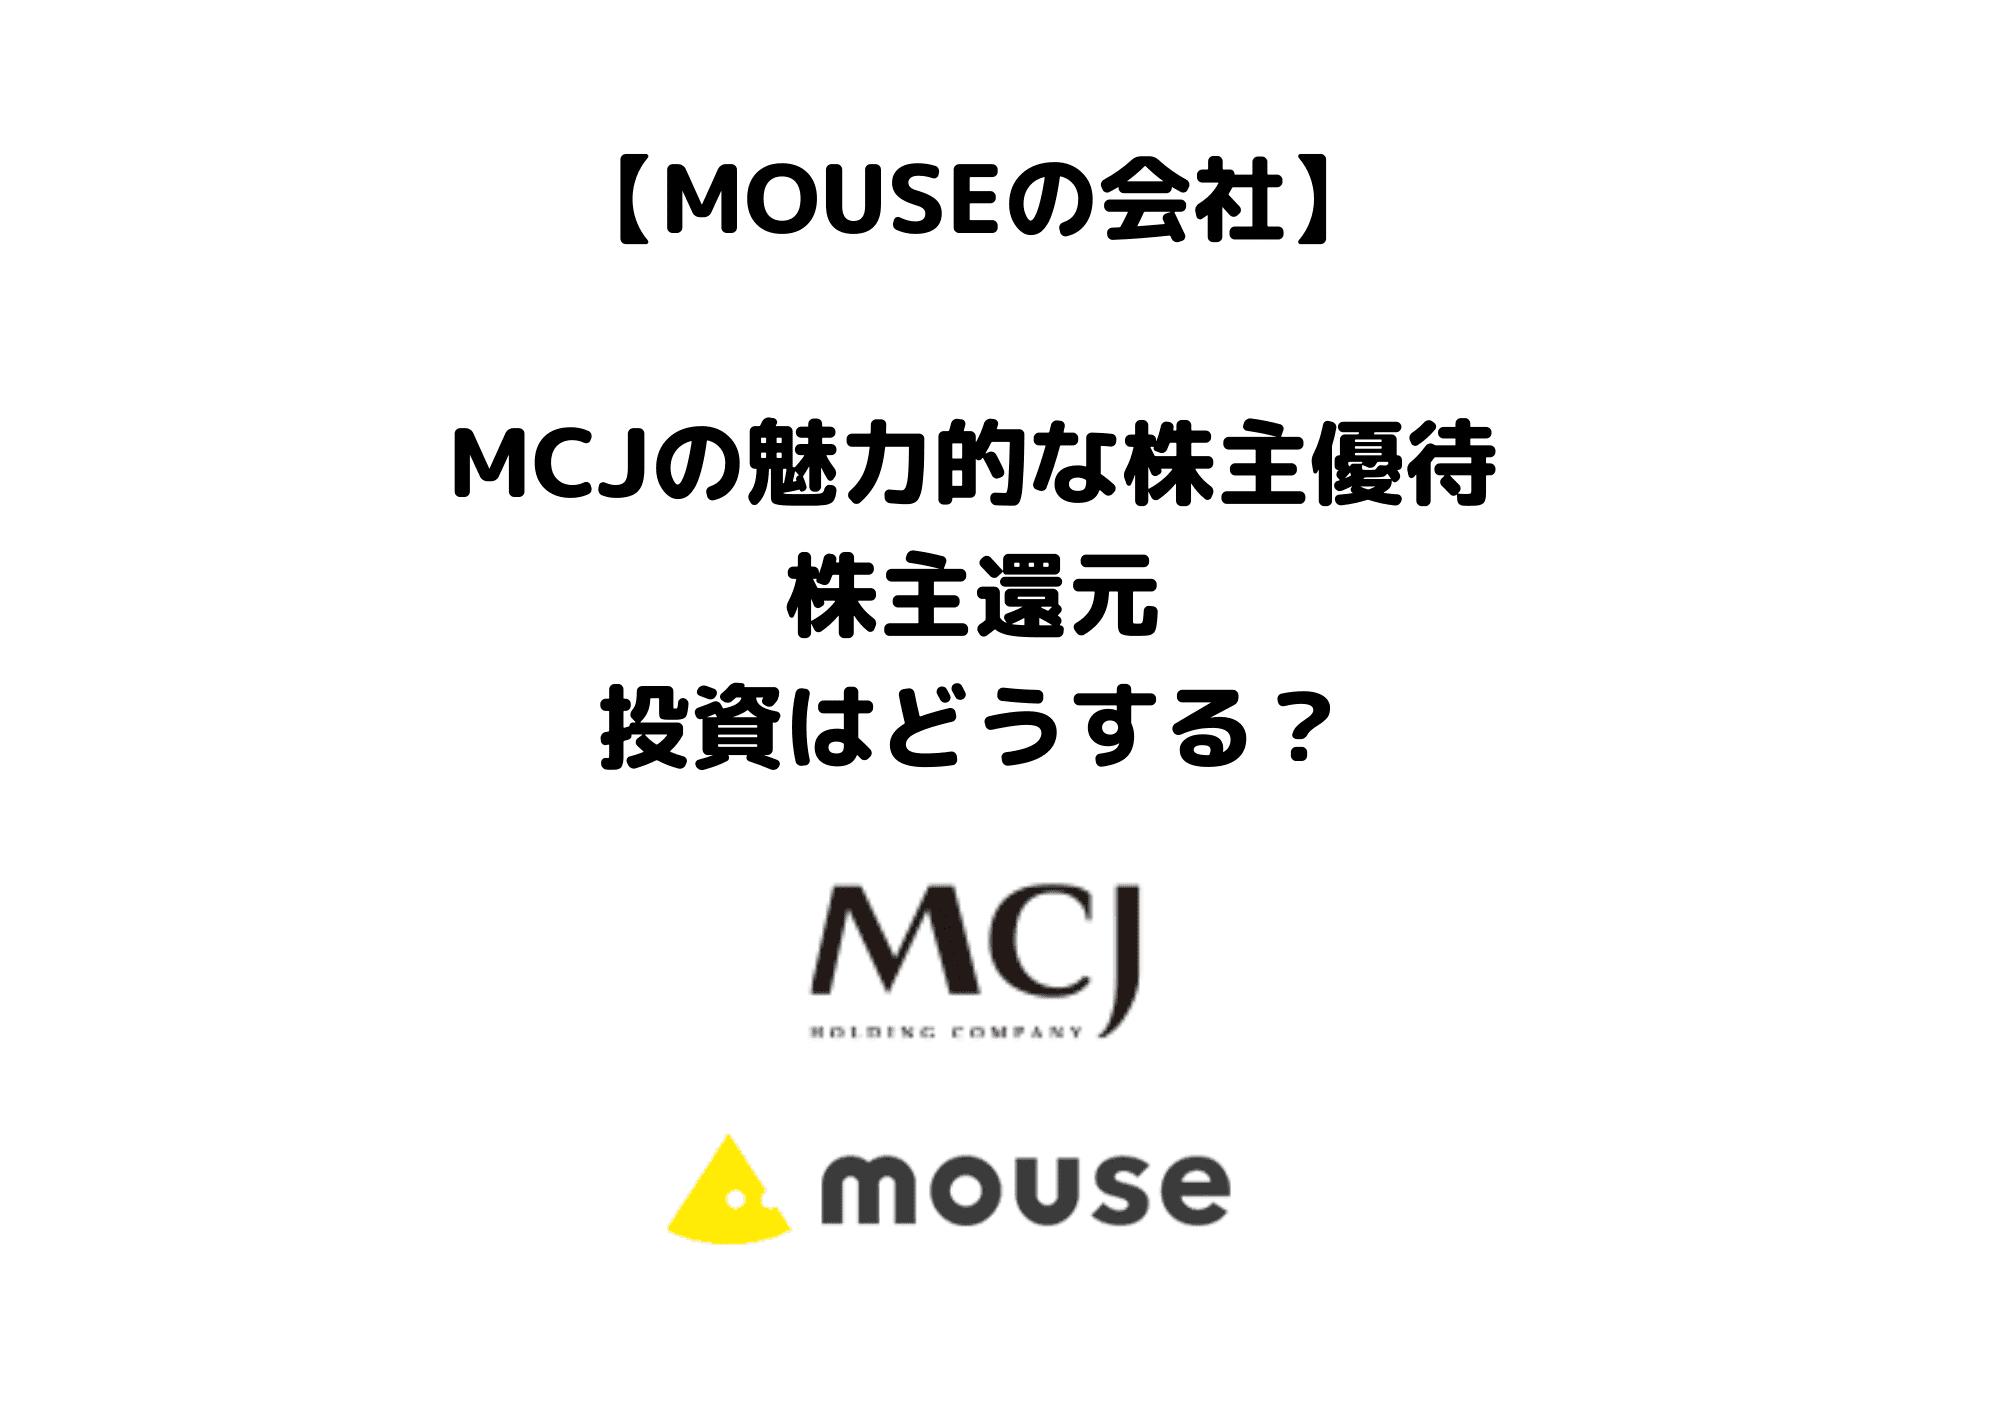 MCJ ノートパソコン